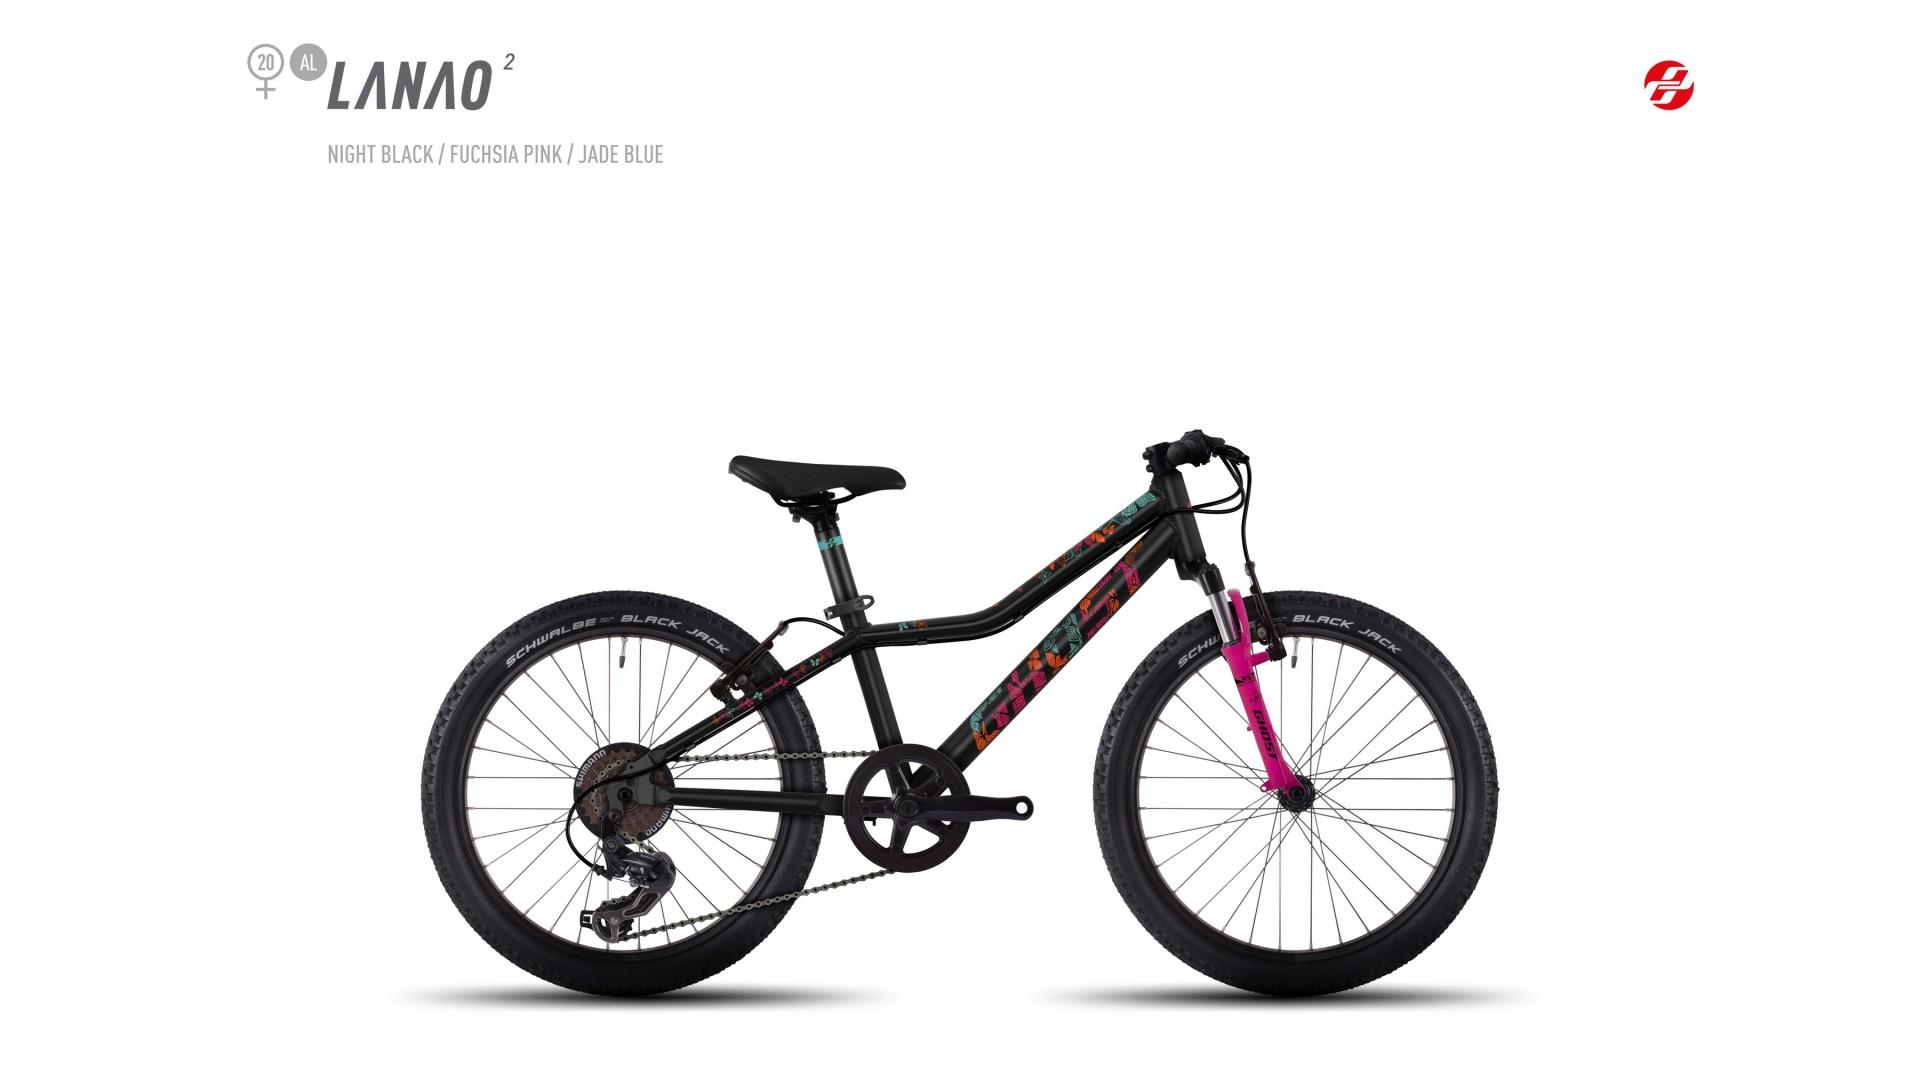 Велосипед GHOST Lanao 2 AL 20 nightblack/fuchsiapink/jadeblue год 2017